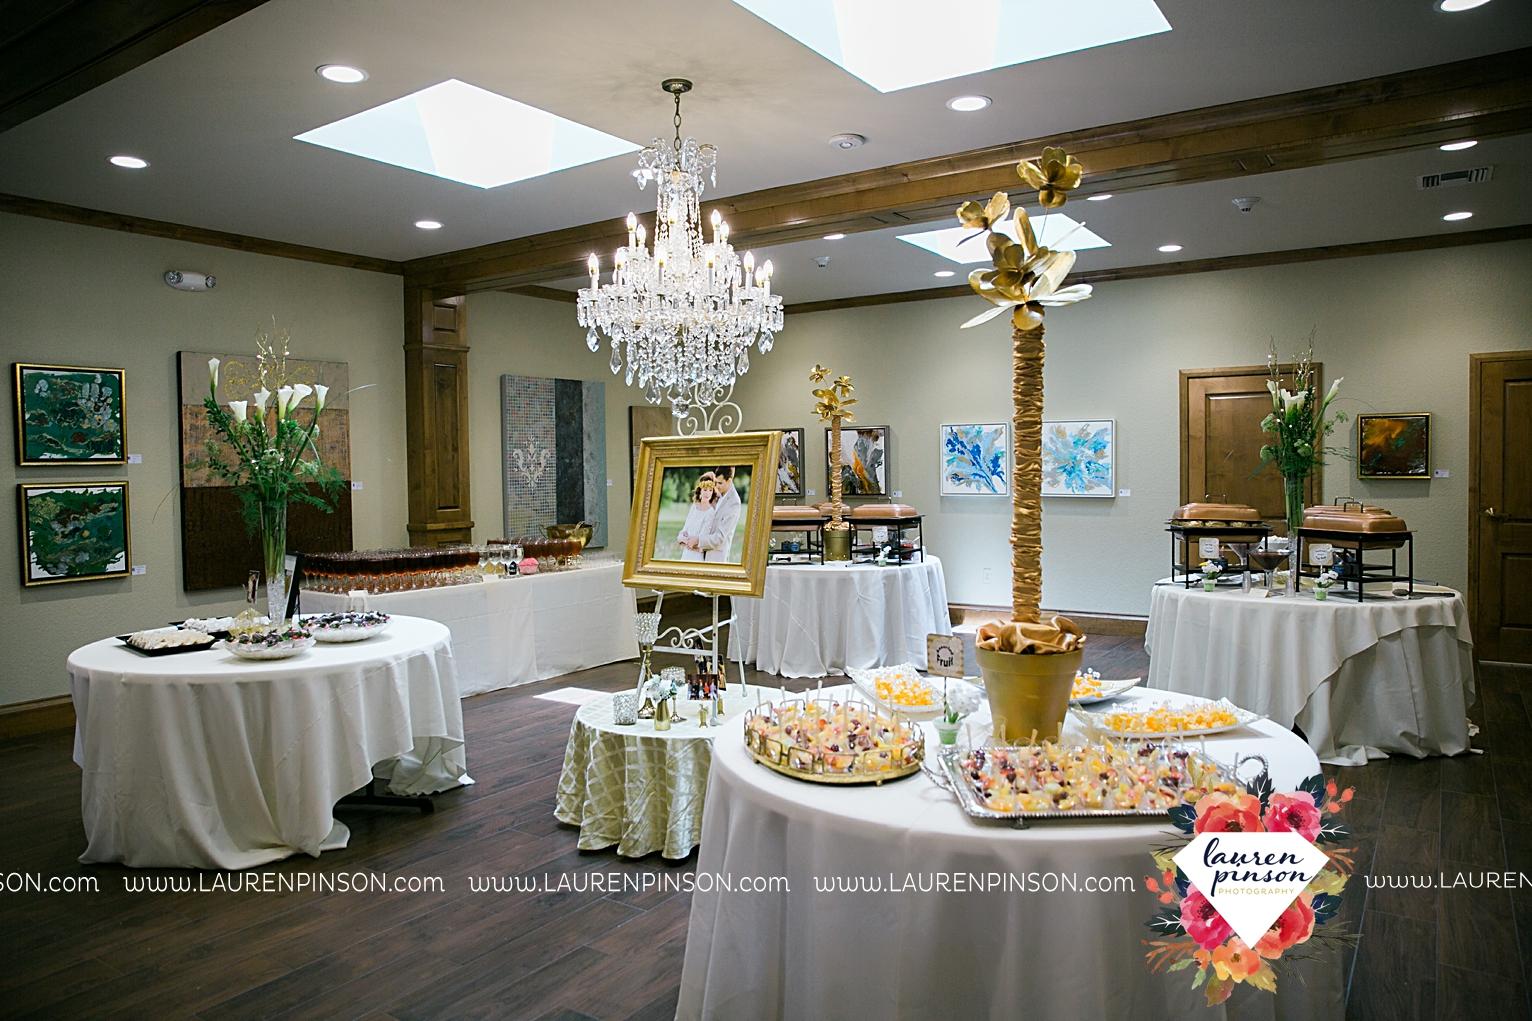 wichita-falls-texas-wedding-photographer-the-forum-by-the-kemp-mayfield-events-ulta-gold-glitter_2873.jpg